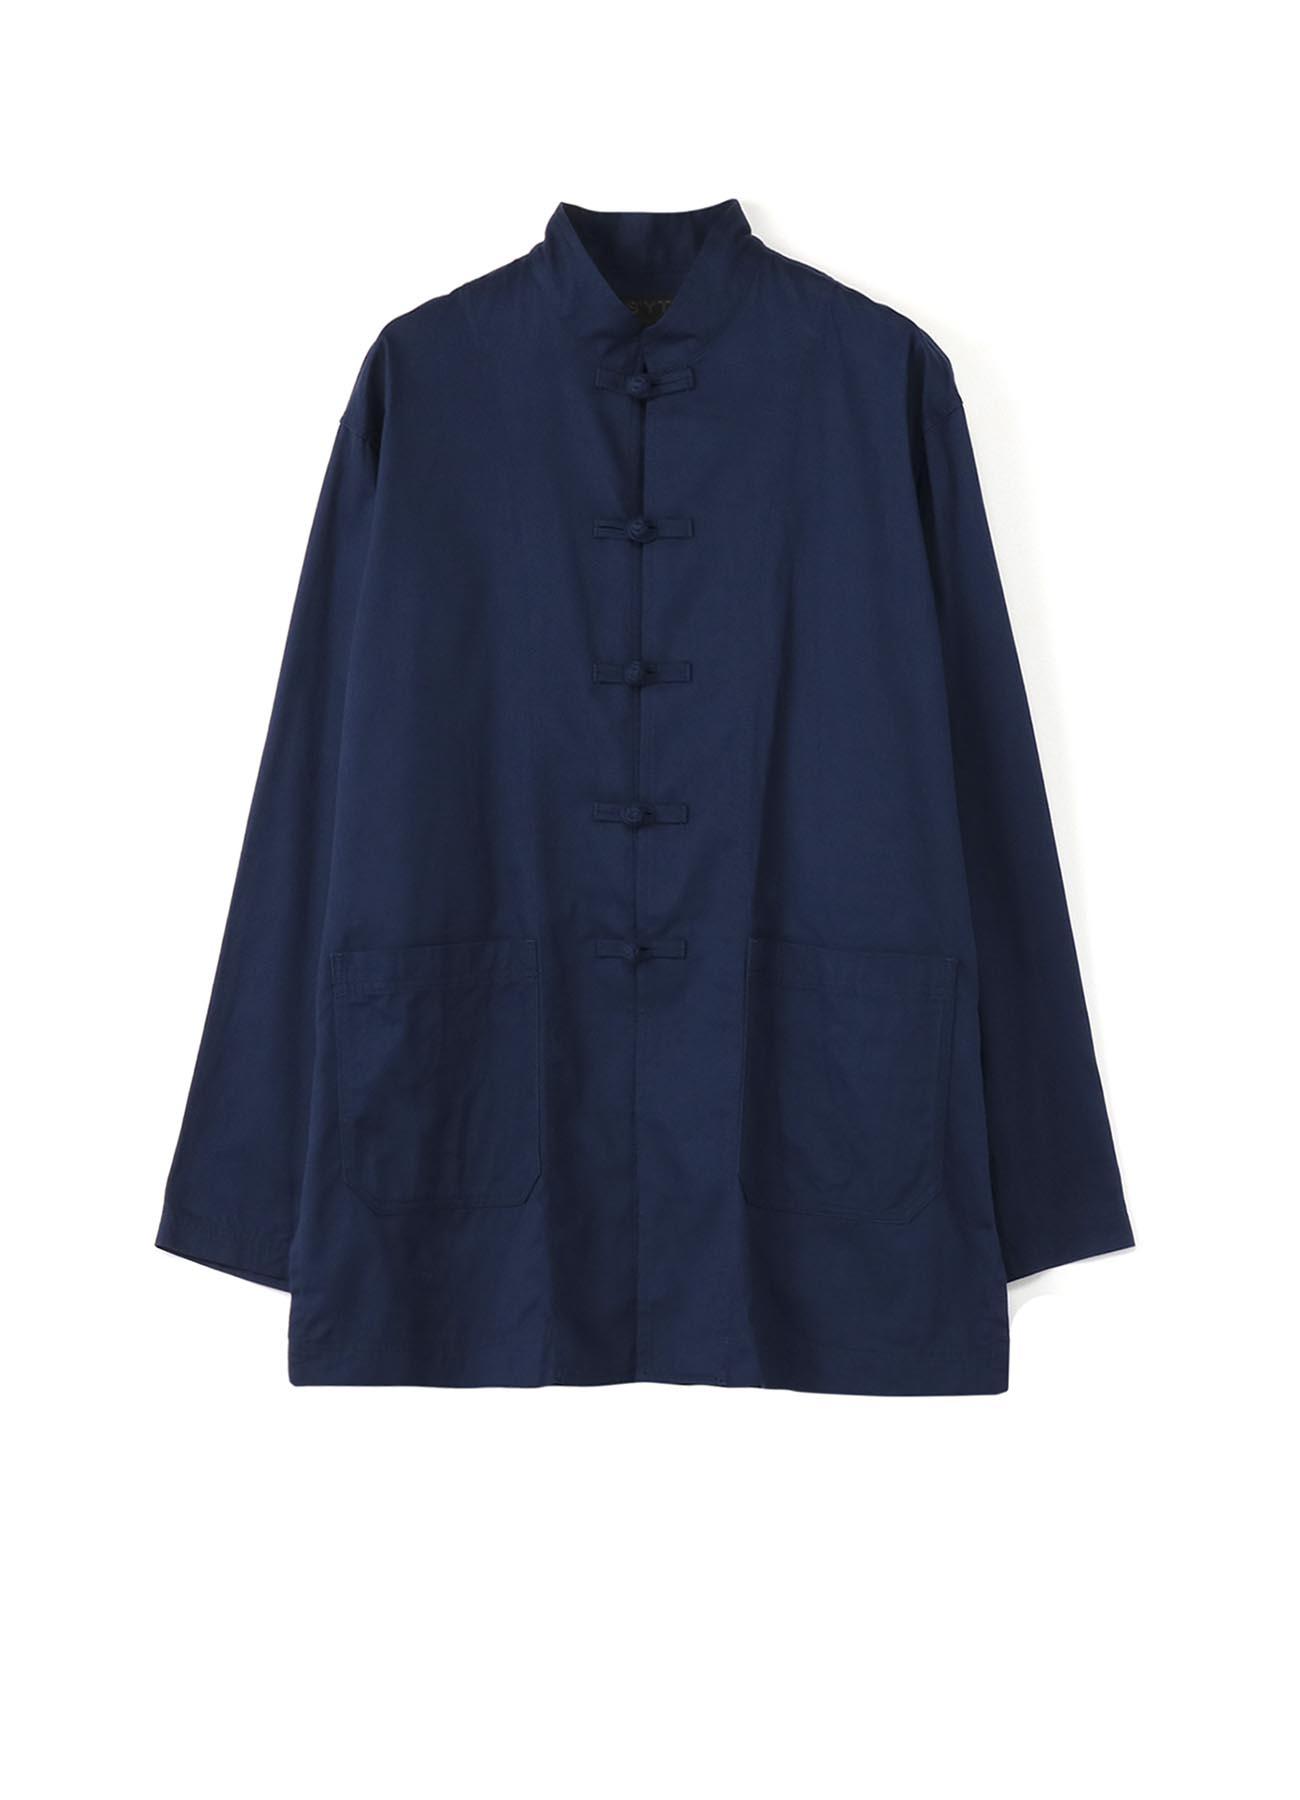 20/Cotton Twill Washer China Jacket